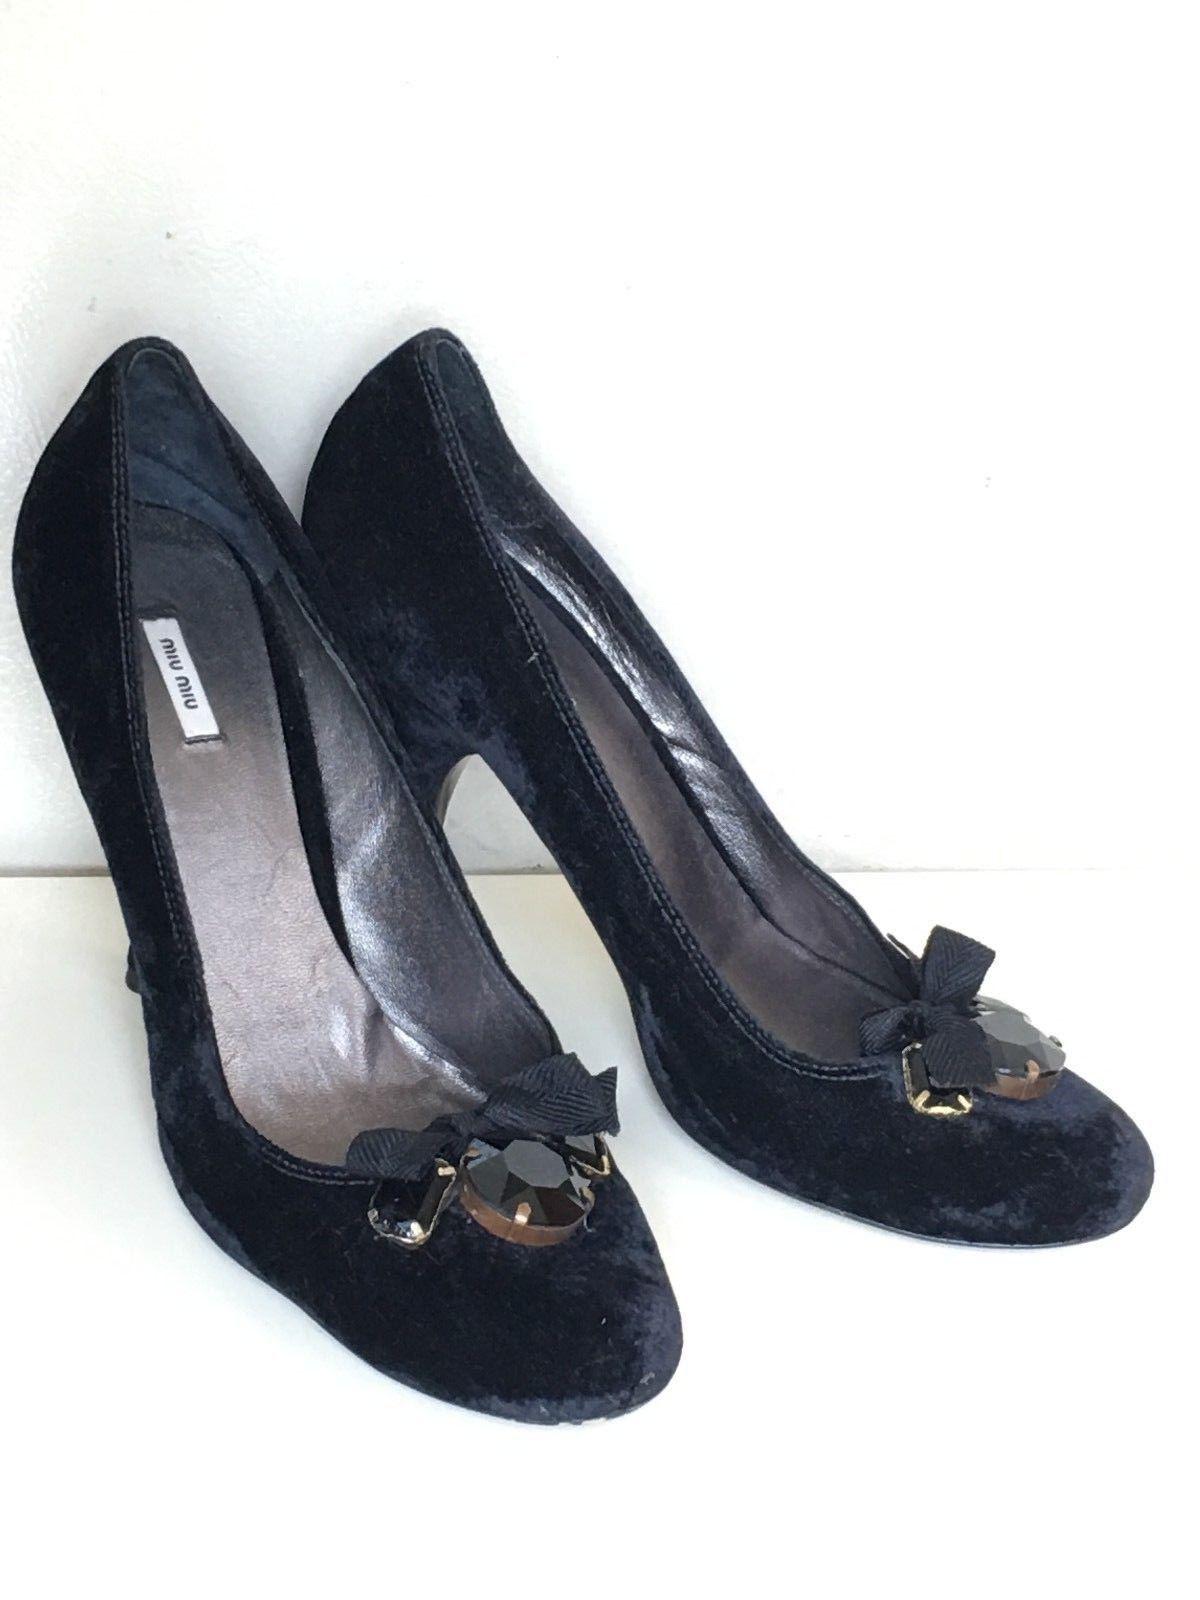 MIU MIU - Vintage Classic Black Velvet Jeweled Bow High Heel Pumps 7 37.5